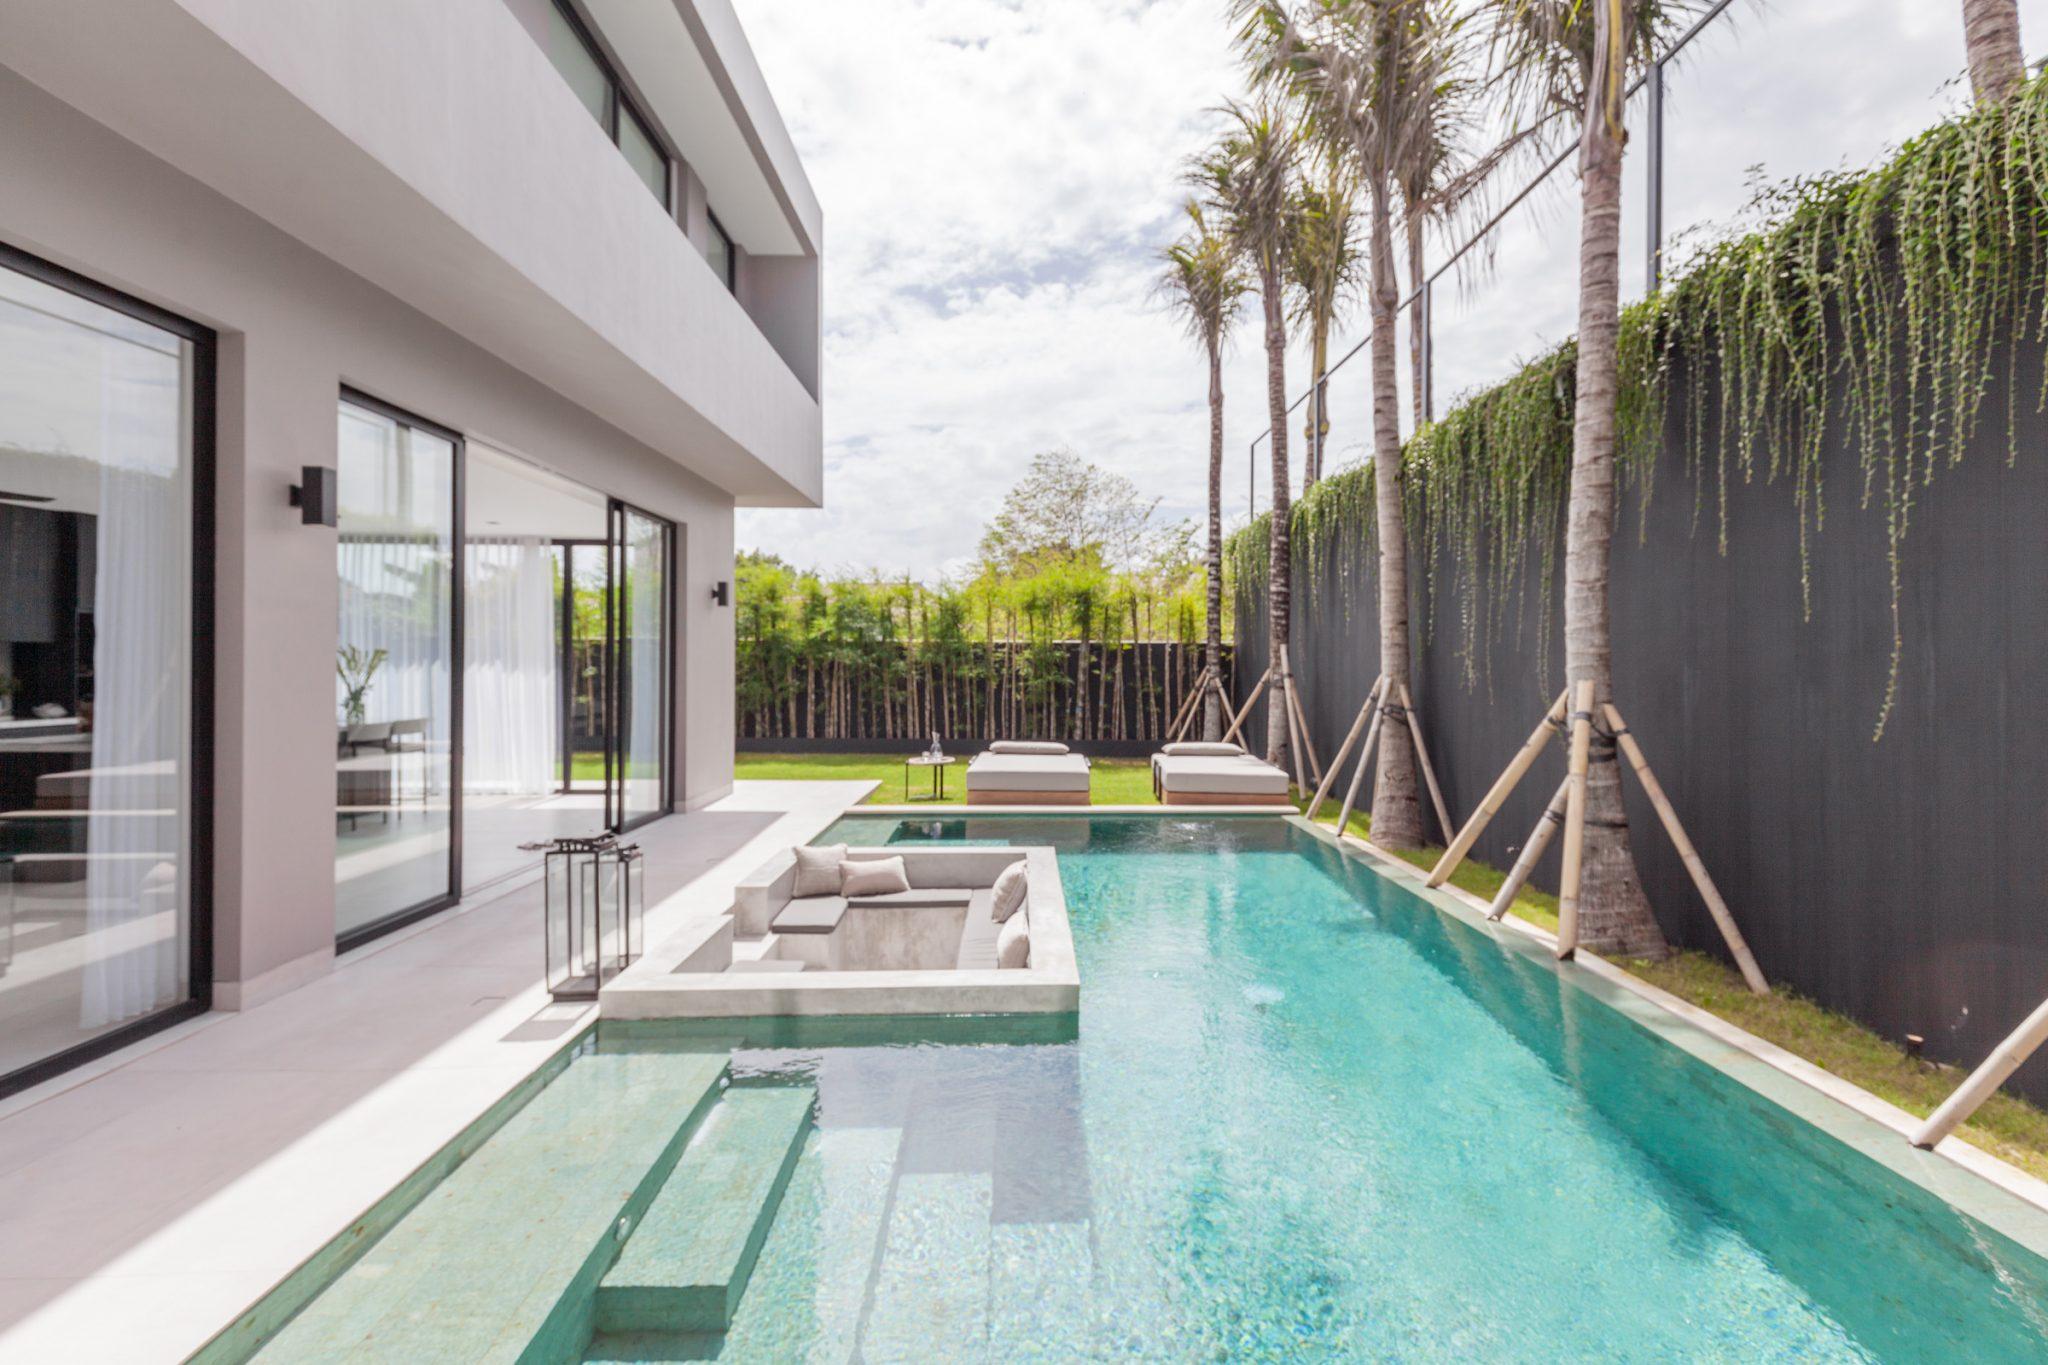 villa Aiko- Bali Interiors